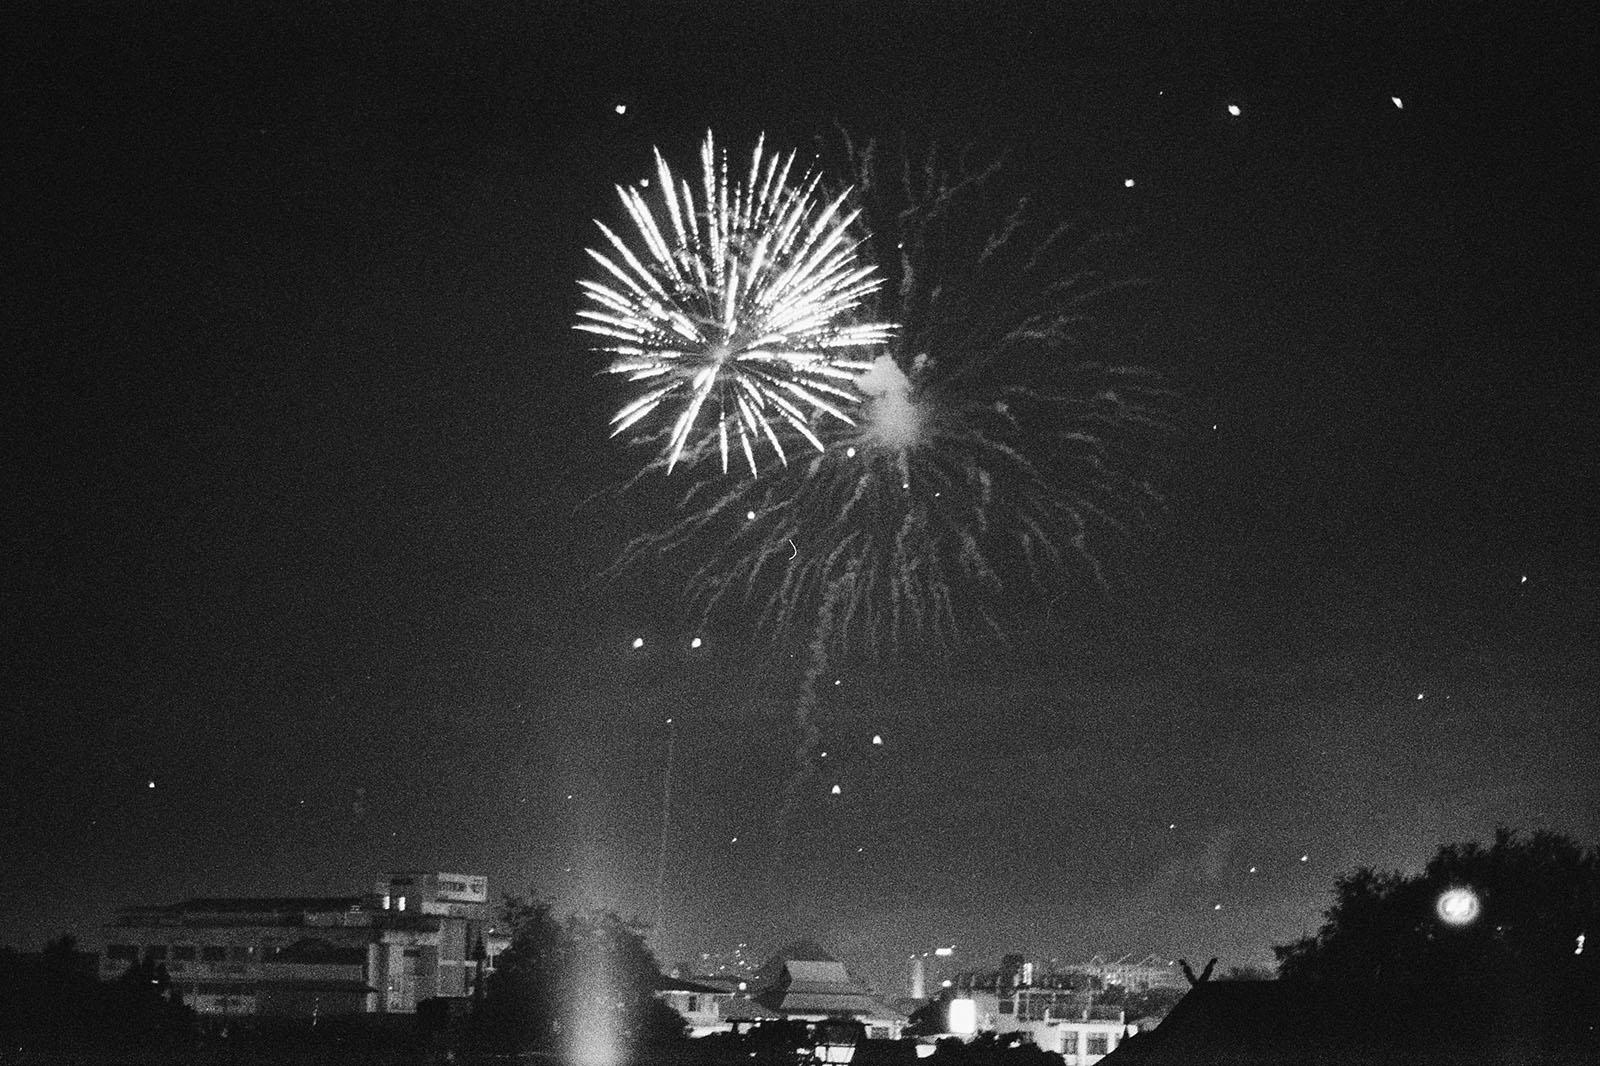 Fireworks during Loi Krathong in Chiang Mai | Thailand Travel Photos